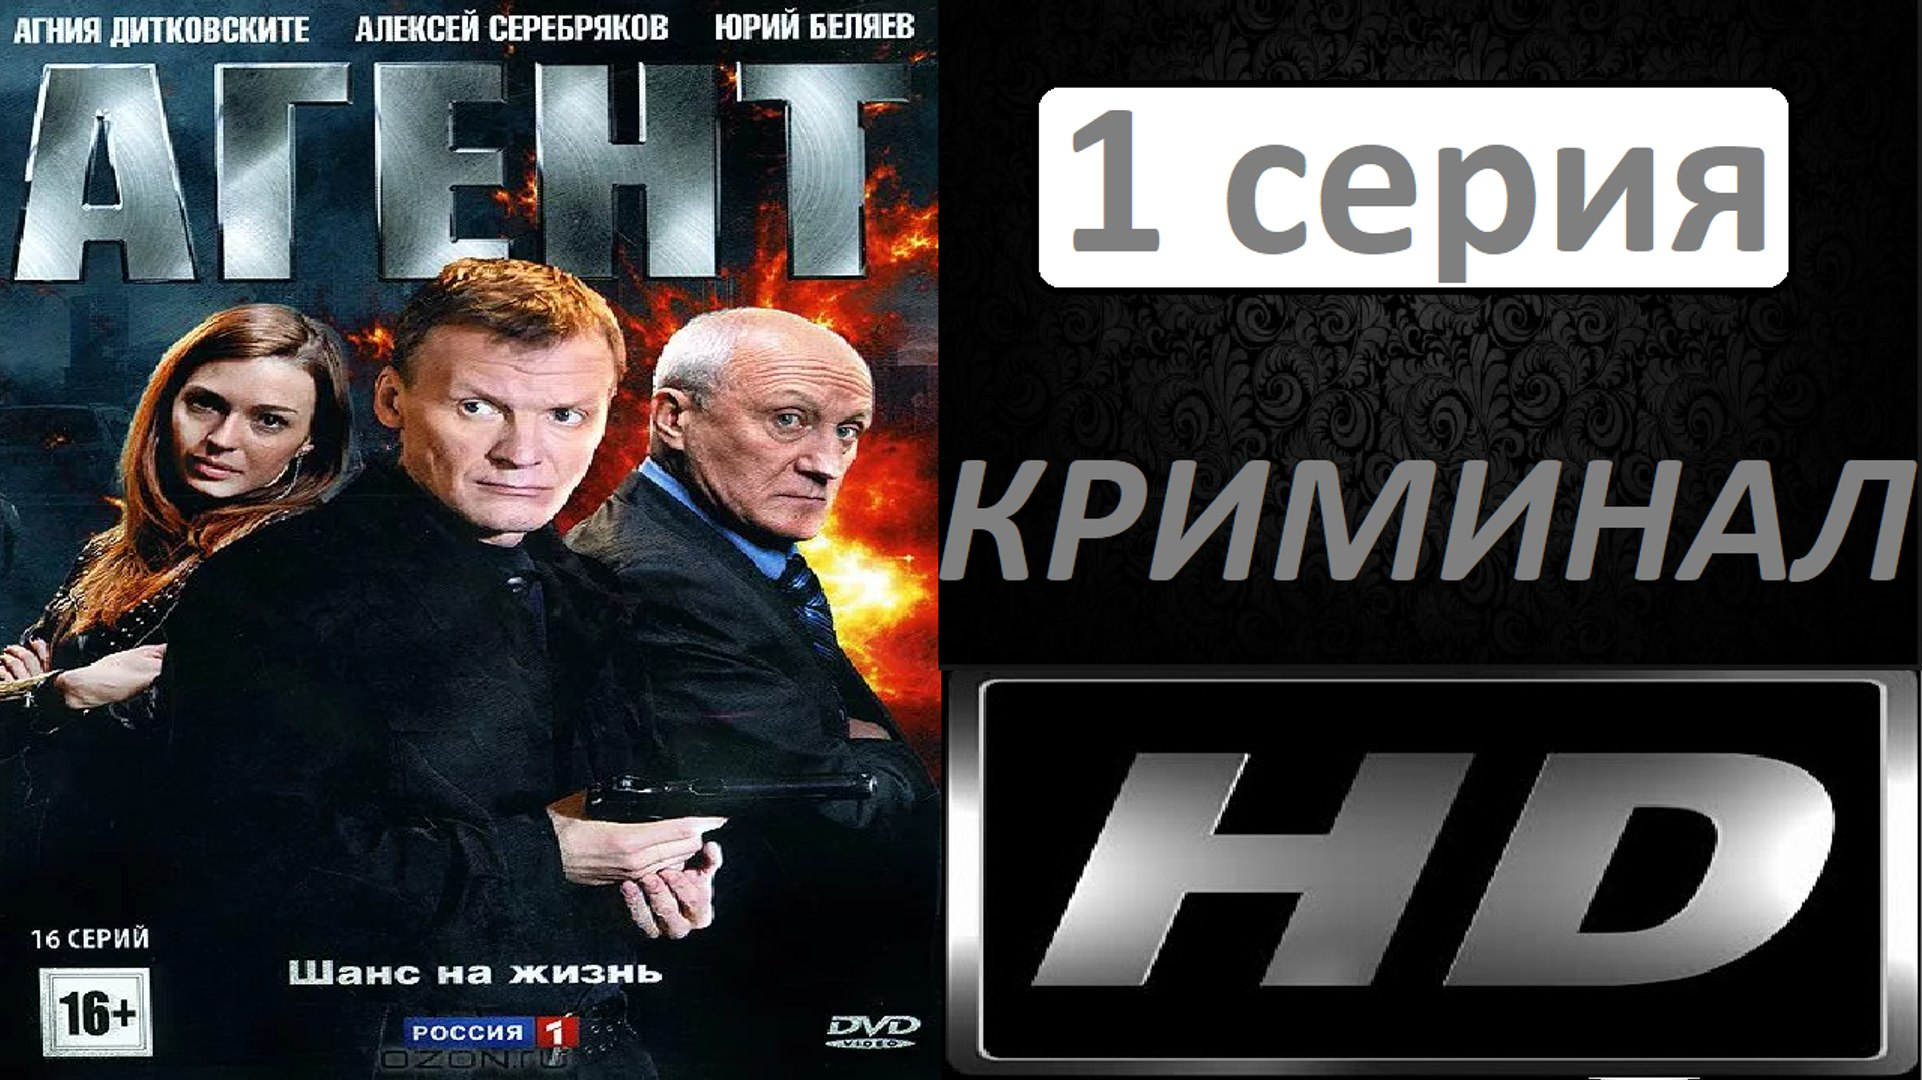 Агент 1 серия HD. Детектив, Криминал. Фильм Новинка 2018